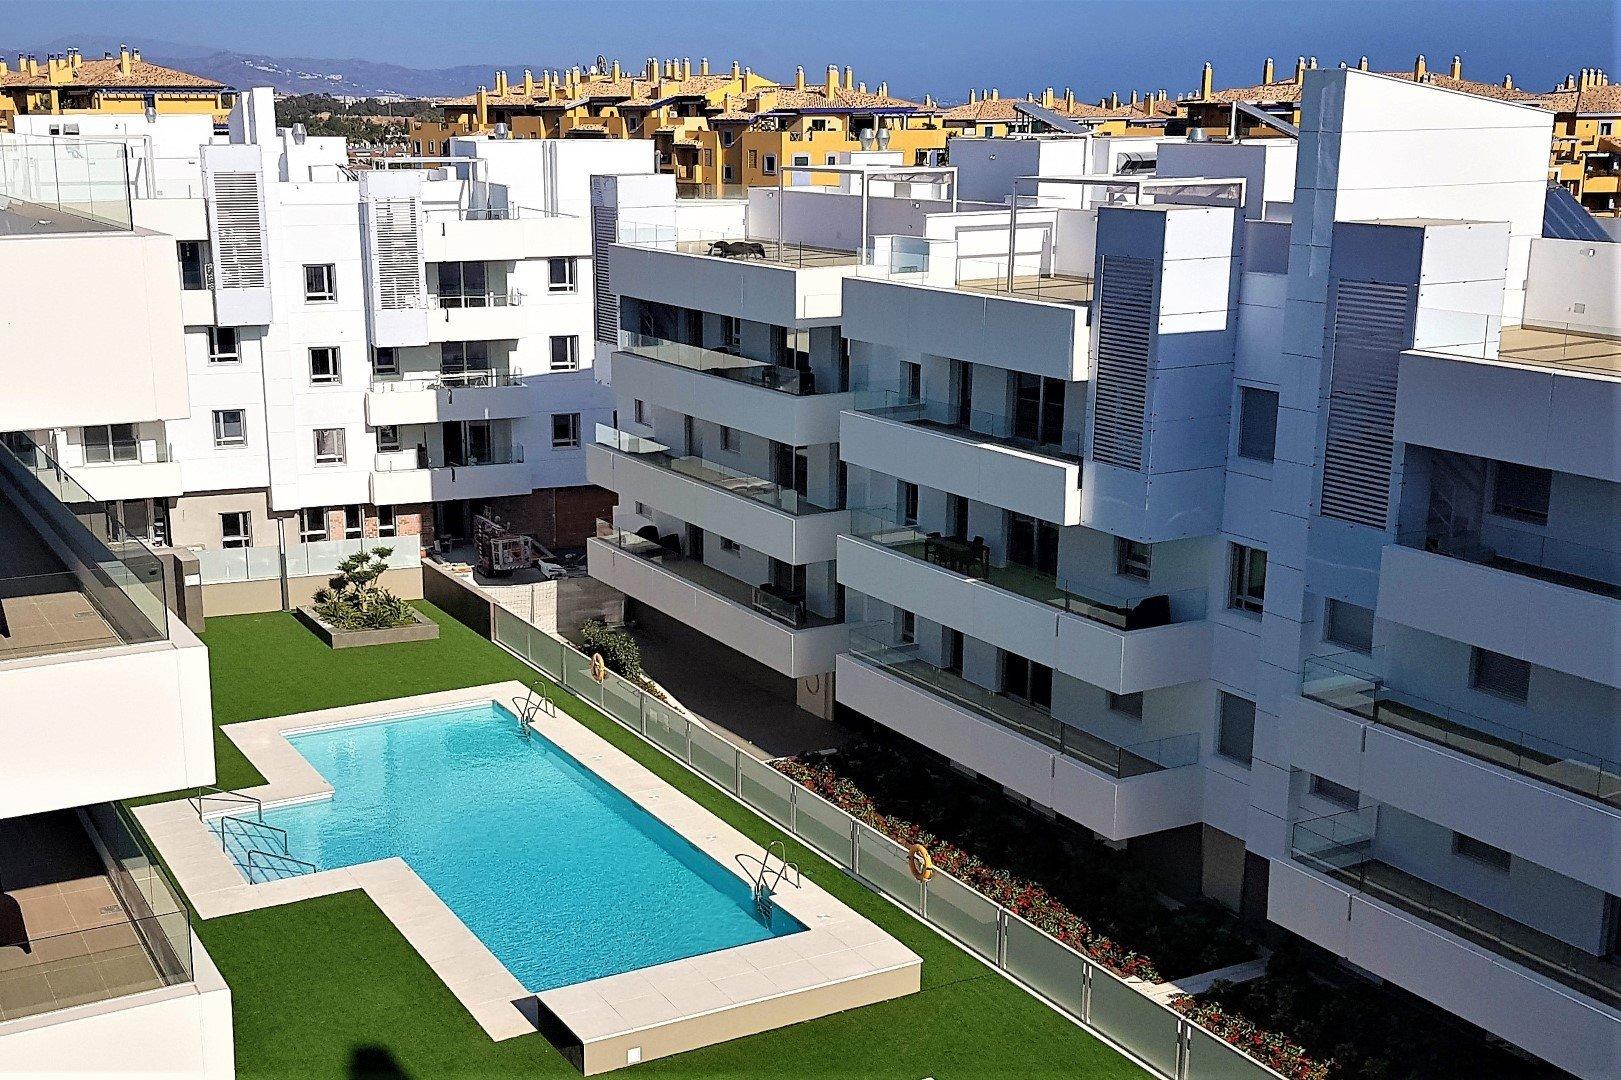 Penthouse te huur in San Pedro Alcantara, Acqua